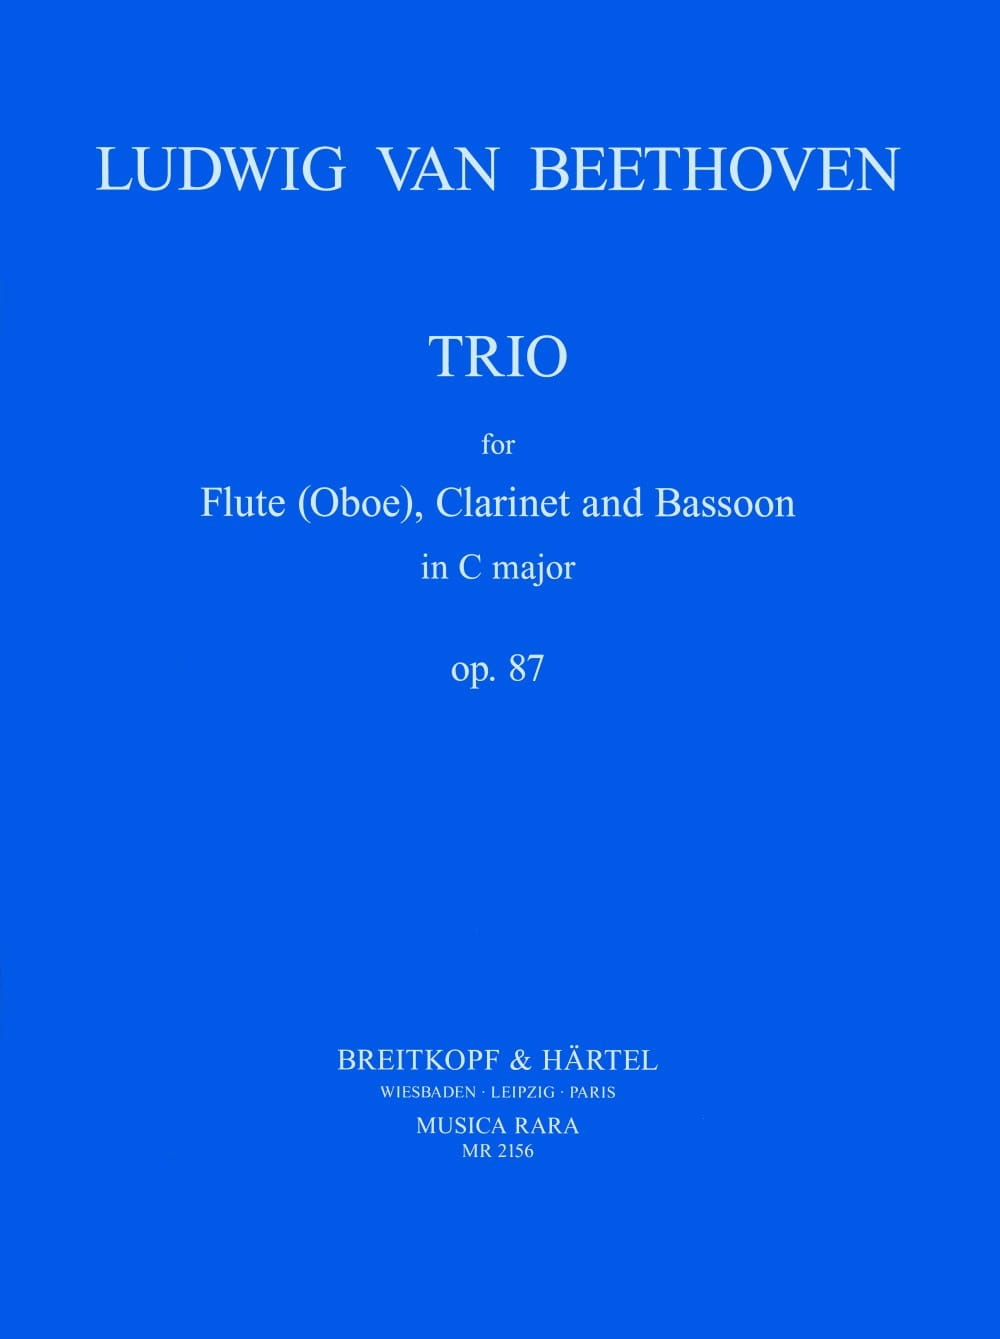 Trio op. 87 -Flute clarinet bassoon - Score + Parts - laflutedepan.com